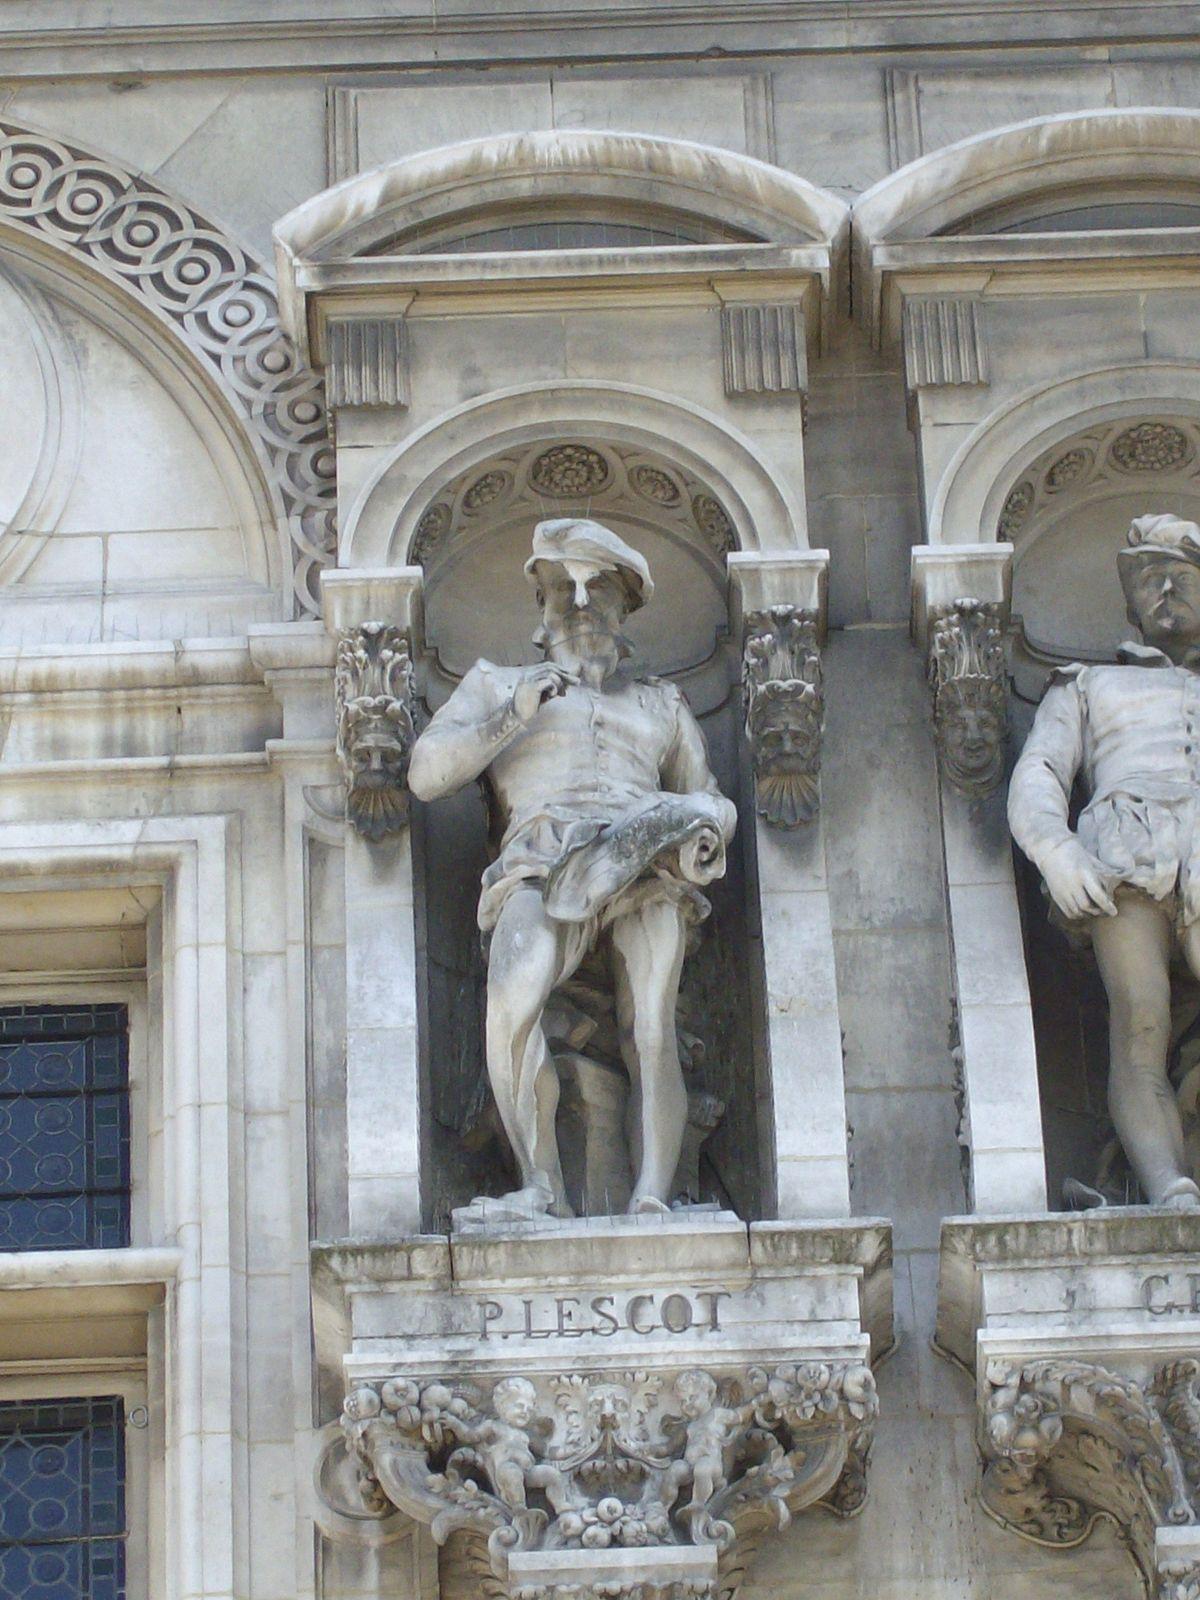 Hotel Du Louvre SaintMalo France